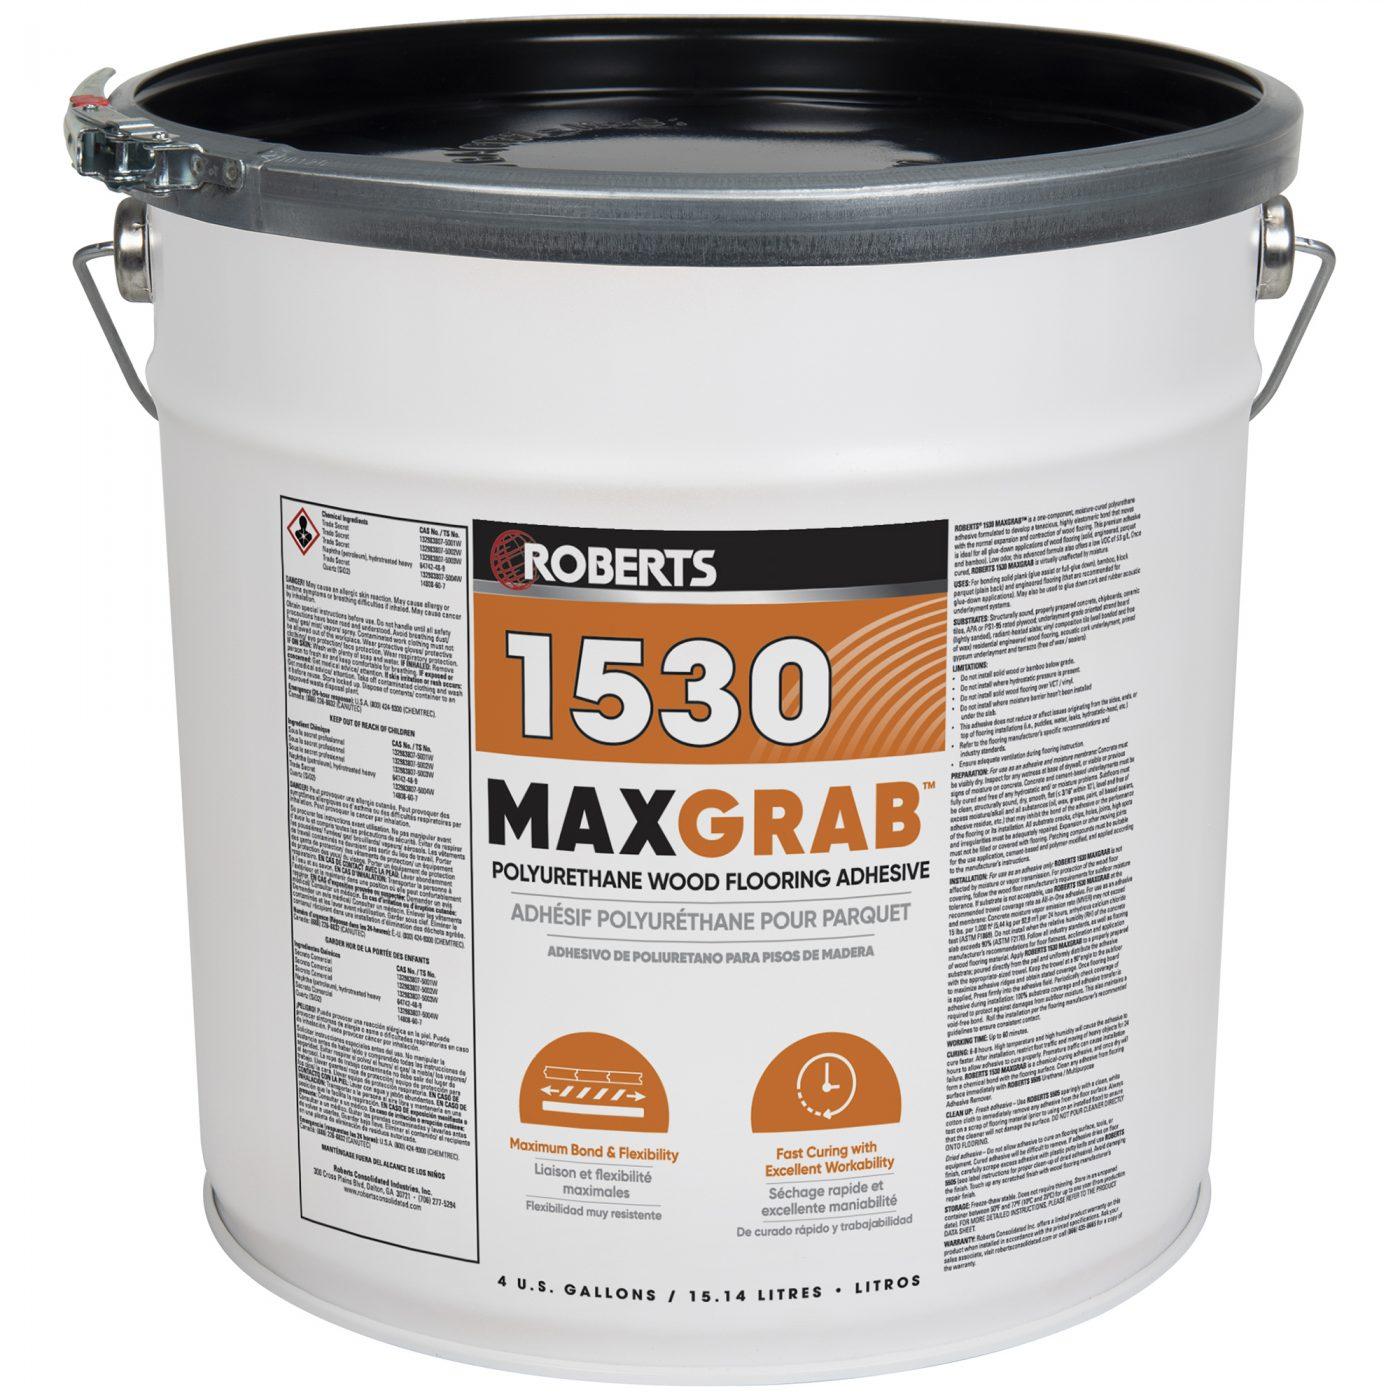 MAXGRAB Polyurethane Wood Flooring Adhesive